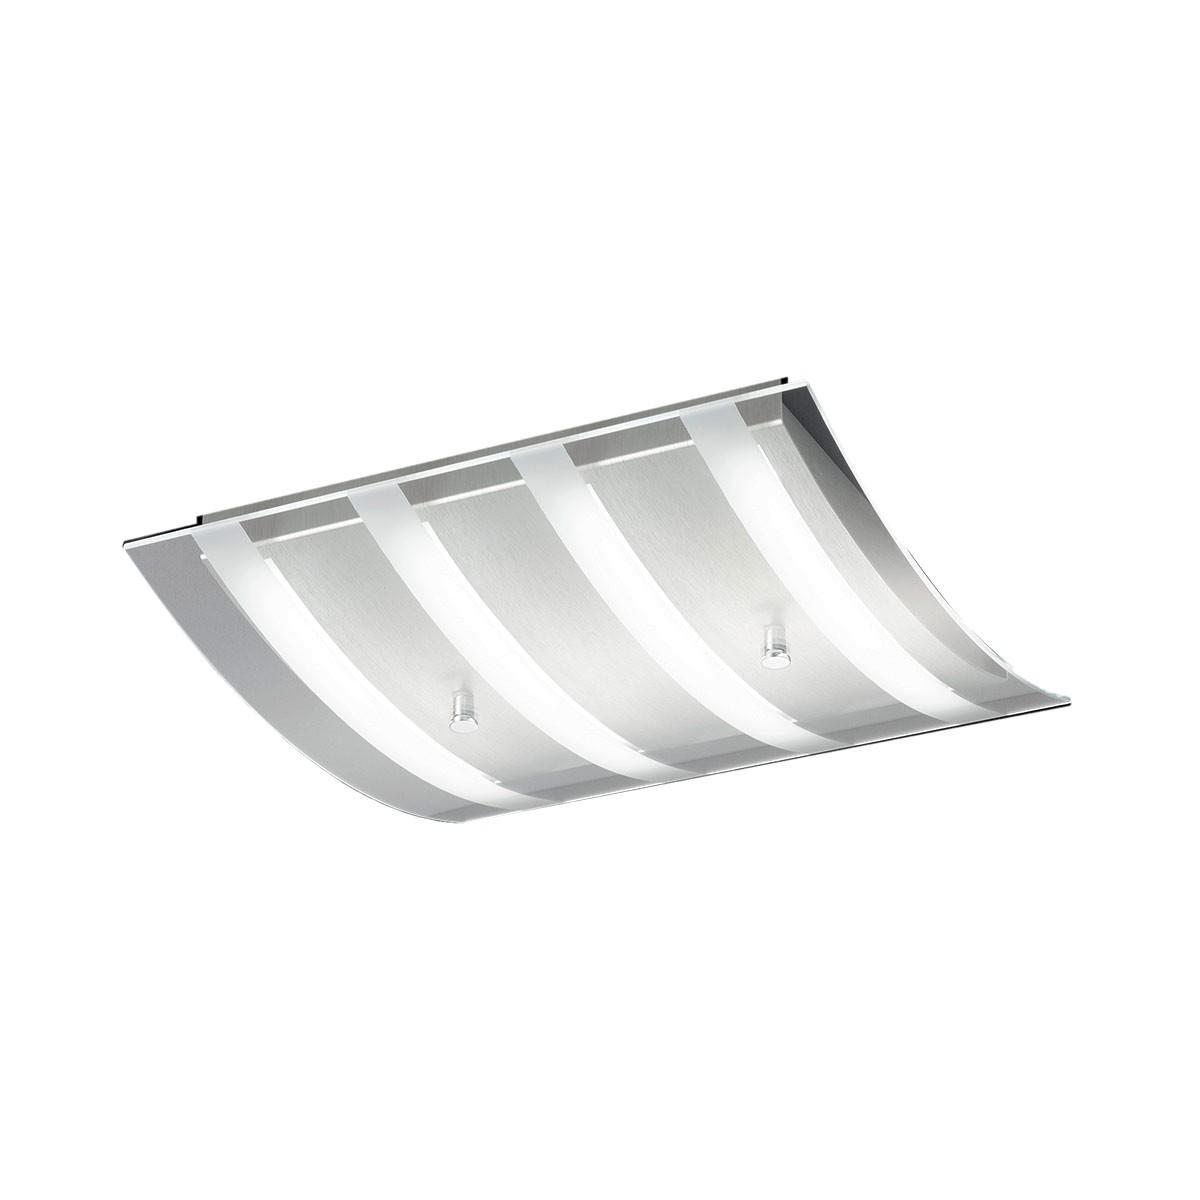 Grossmann Vita LED Deckenleuchte, Aluminium gebürstet